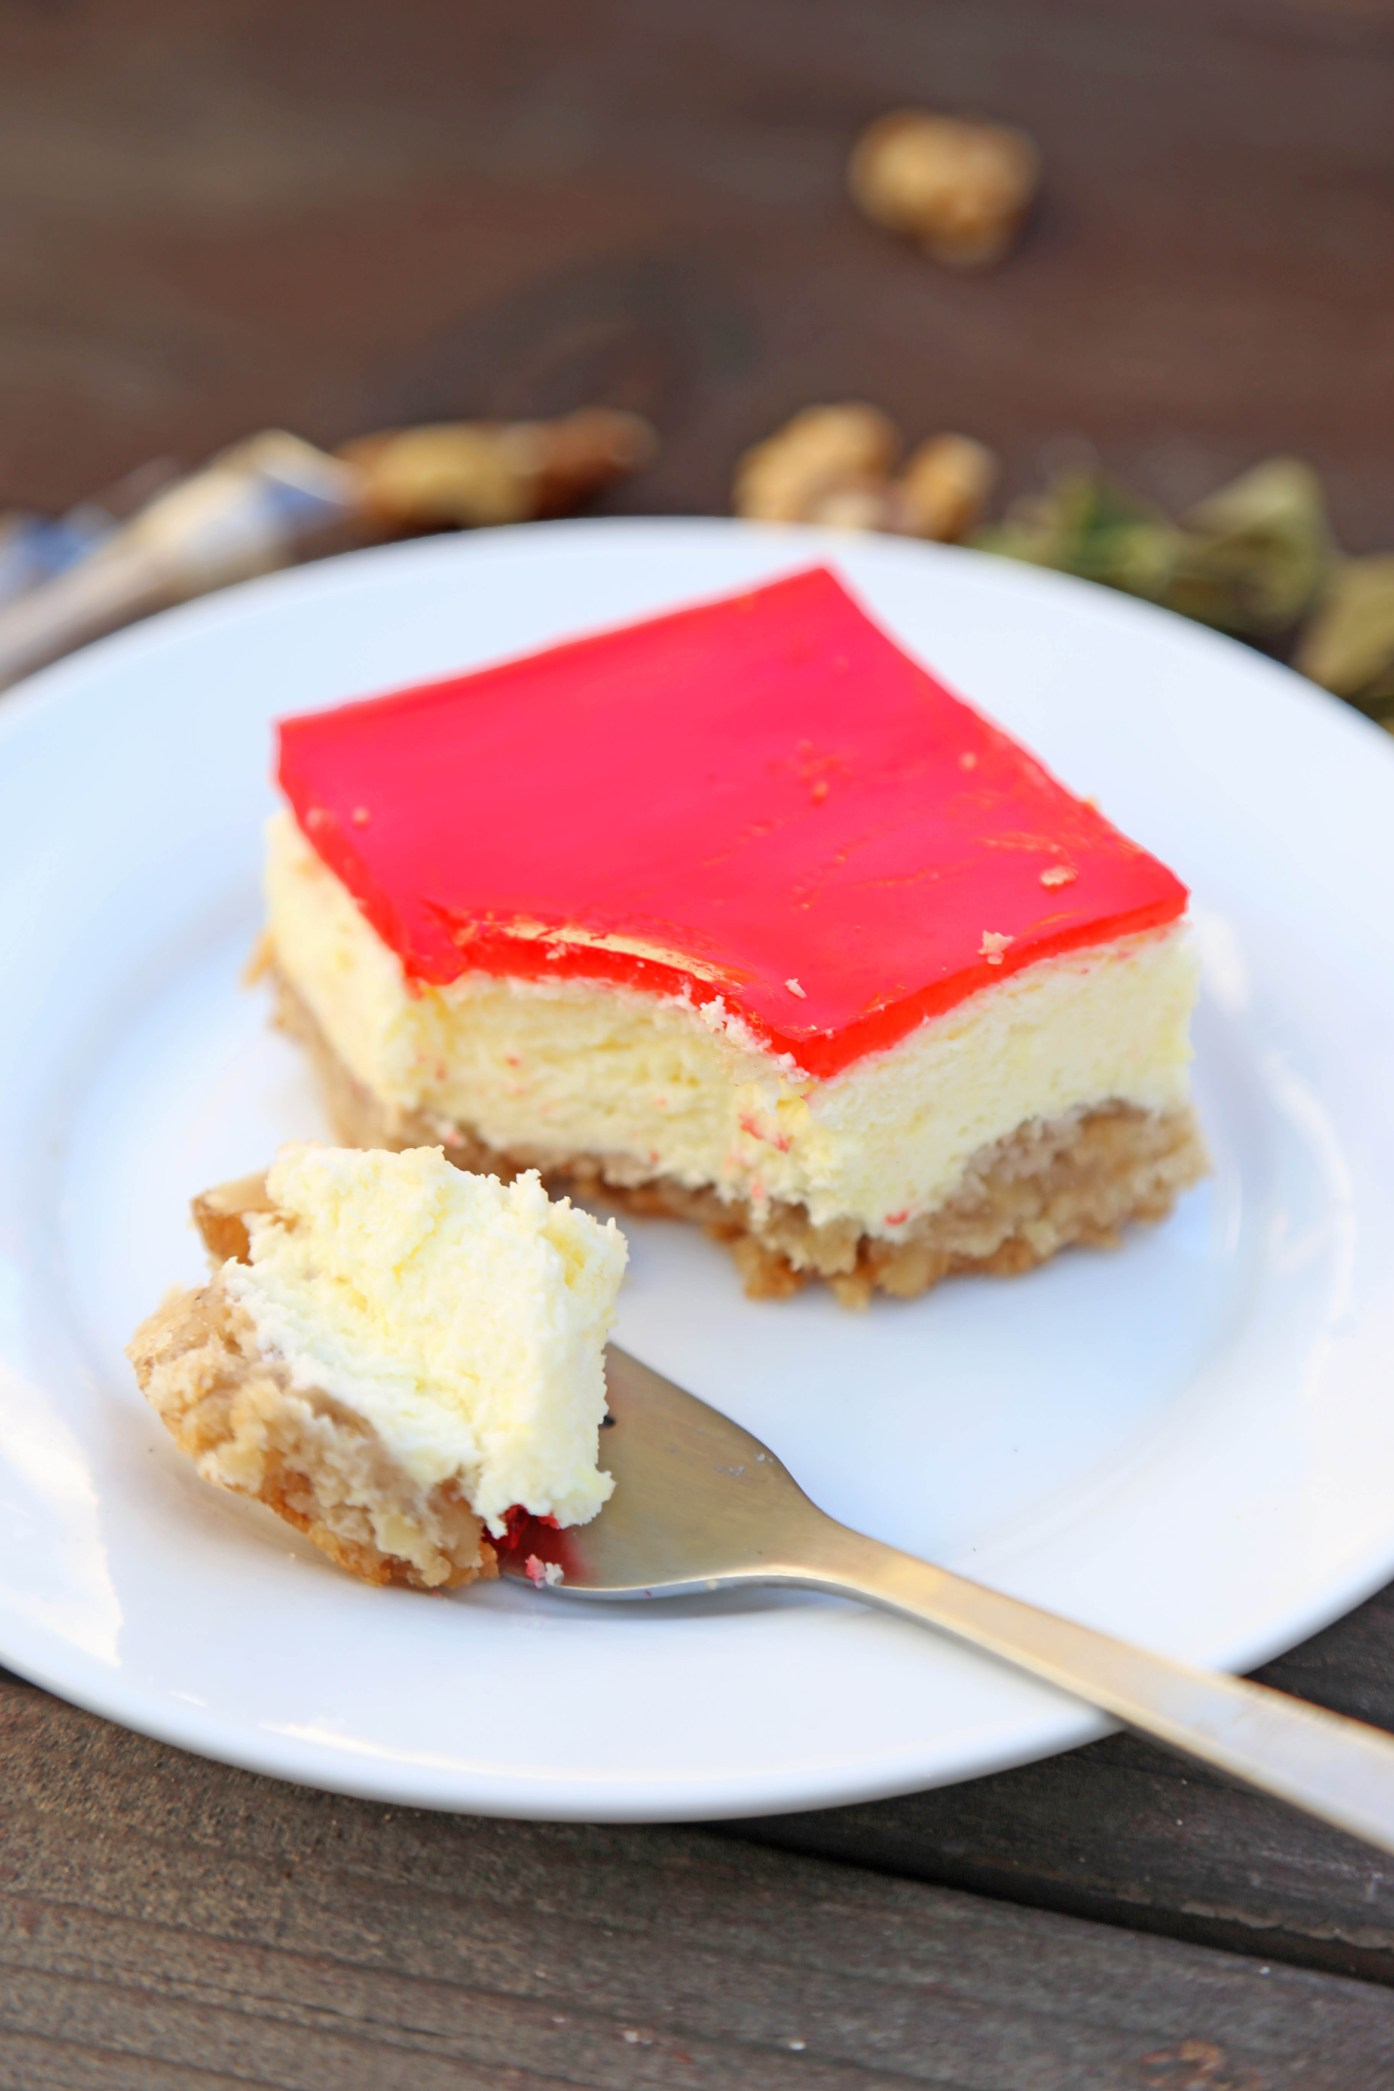 Auntie Arleen's Famous Jello Cheesecake